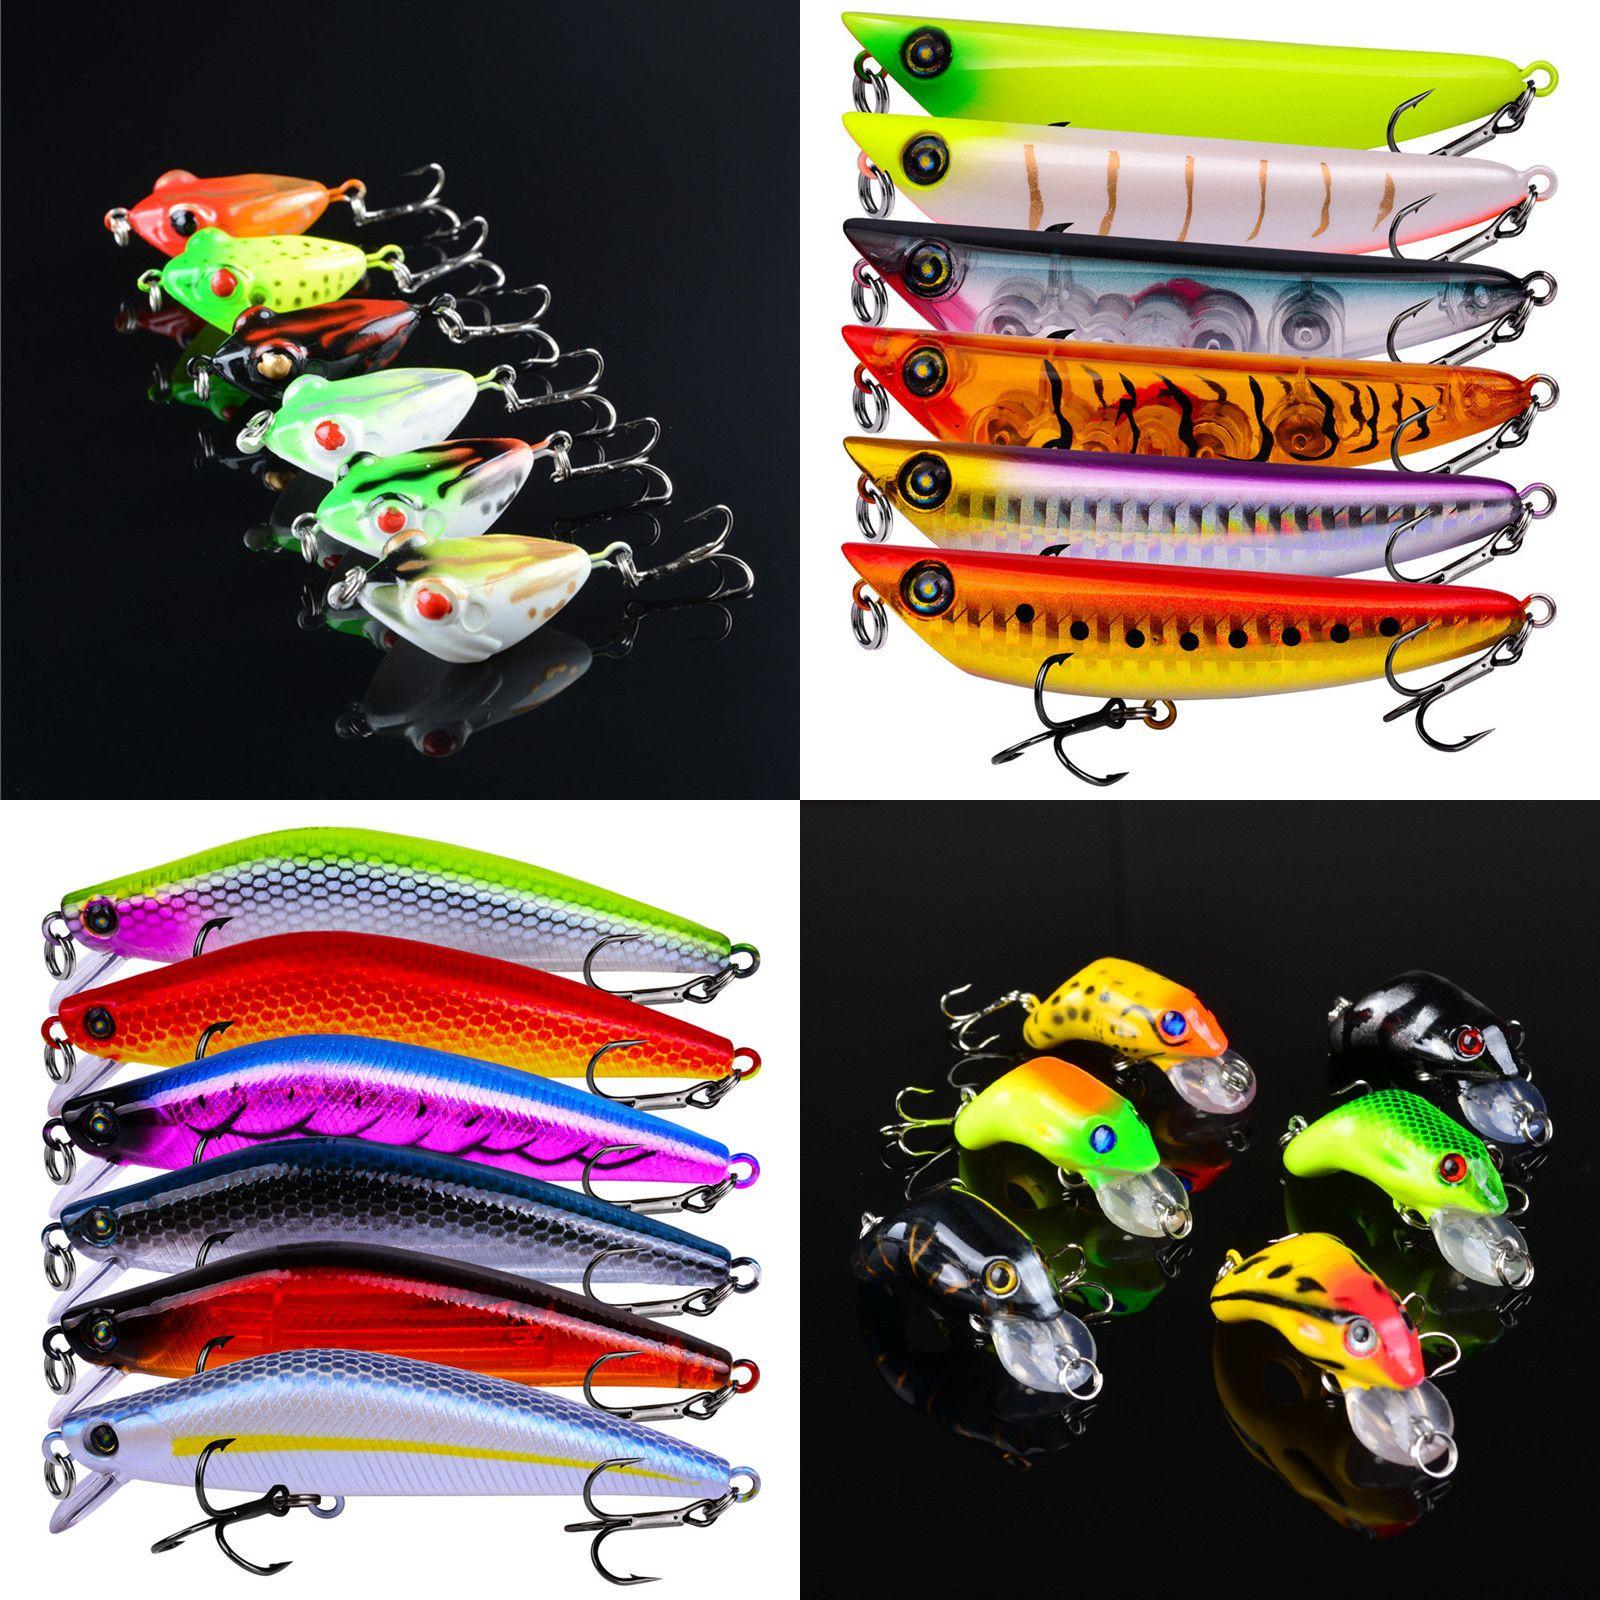 Mixed 6 Color 4g-14.15g(4cm-10.5cm) Plastic Hard Baits & Lures 8/6/4# Hook Fishing Hooks Fishhooks Fishing Accessories